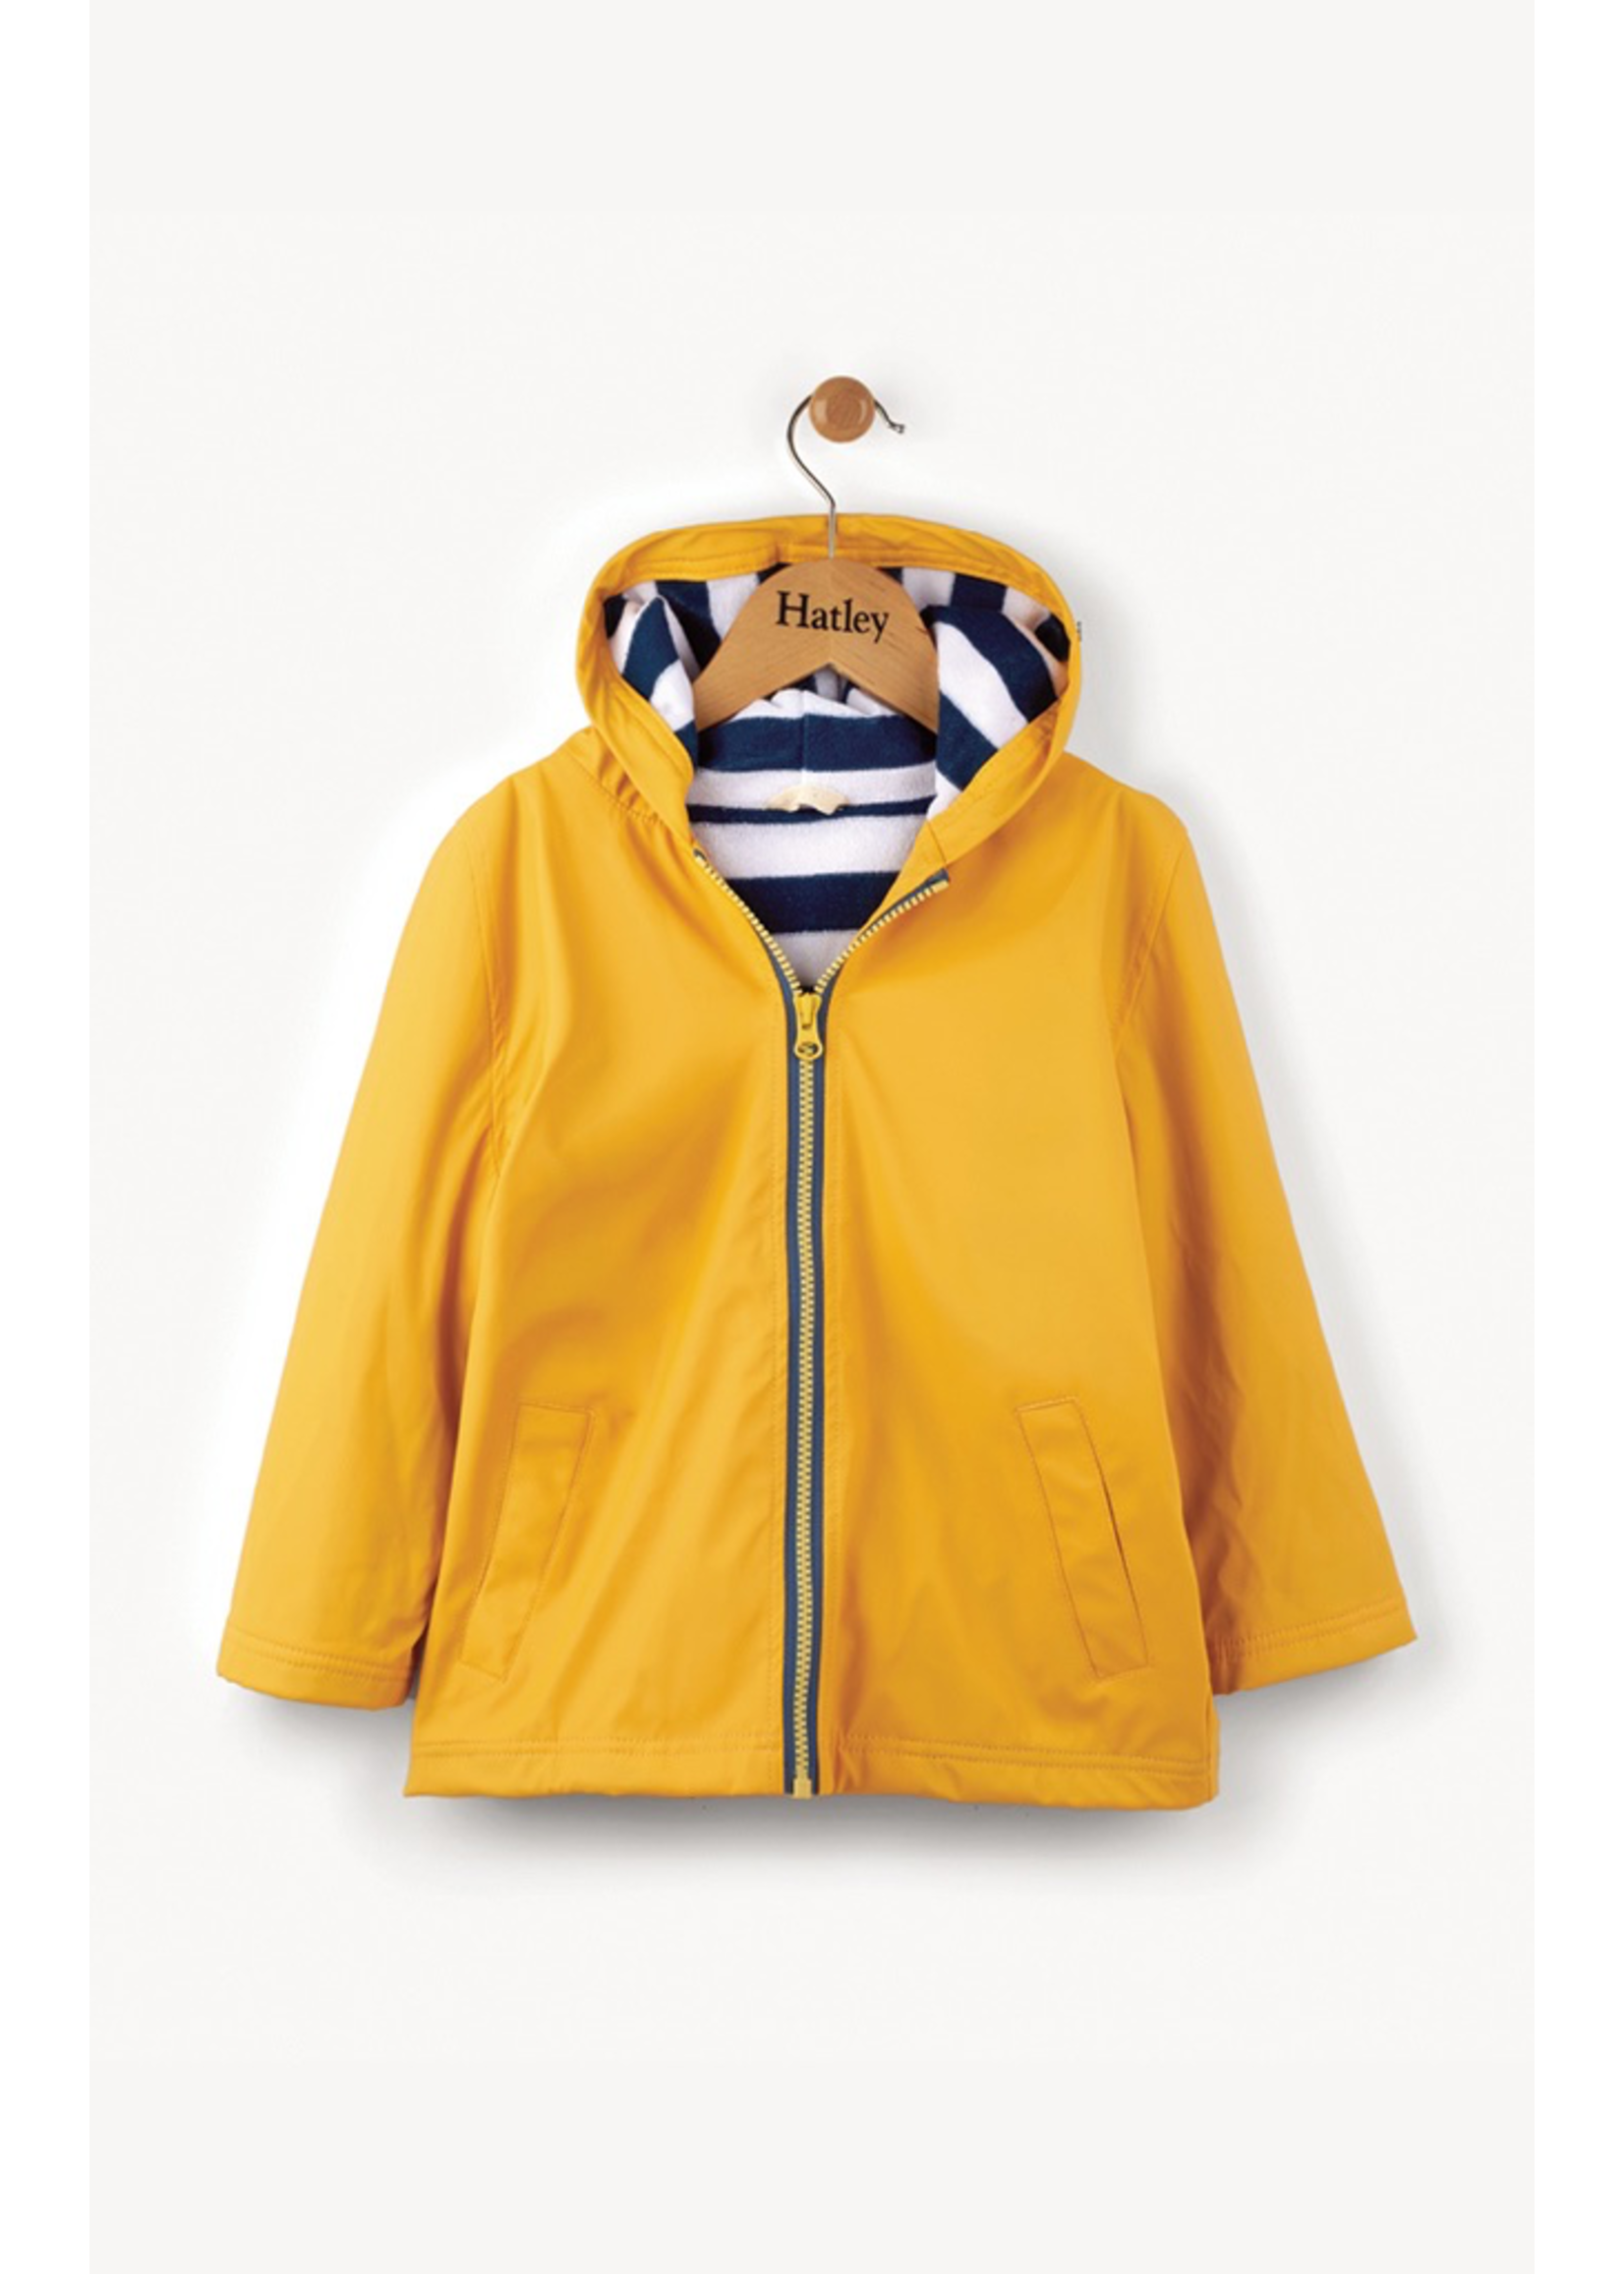 Hatley Hatley, Yellow & Navy Splash Jacket for Boy